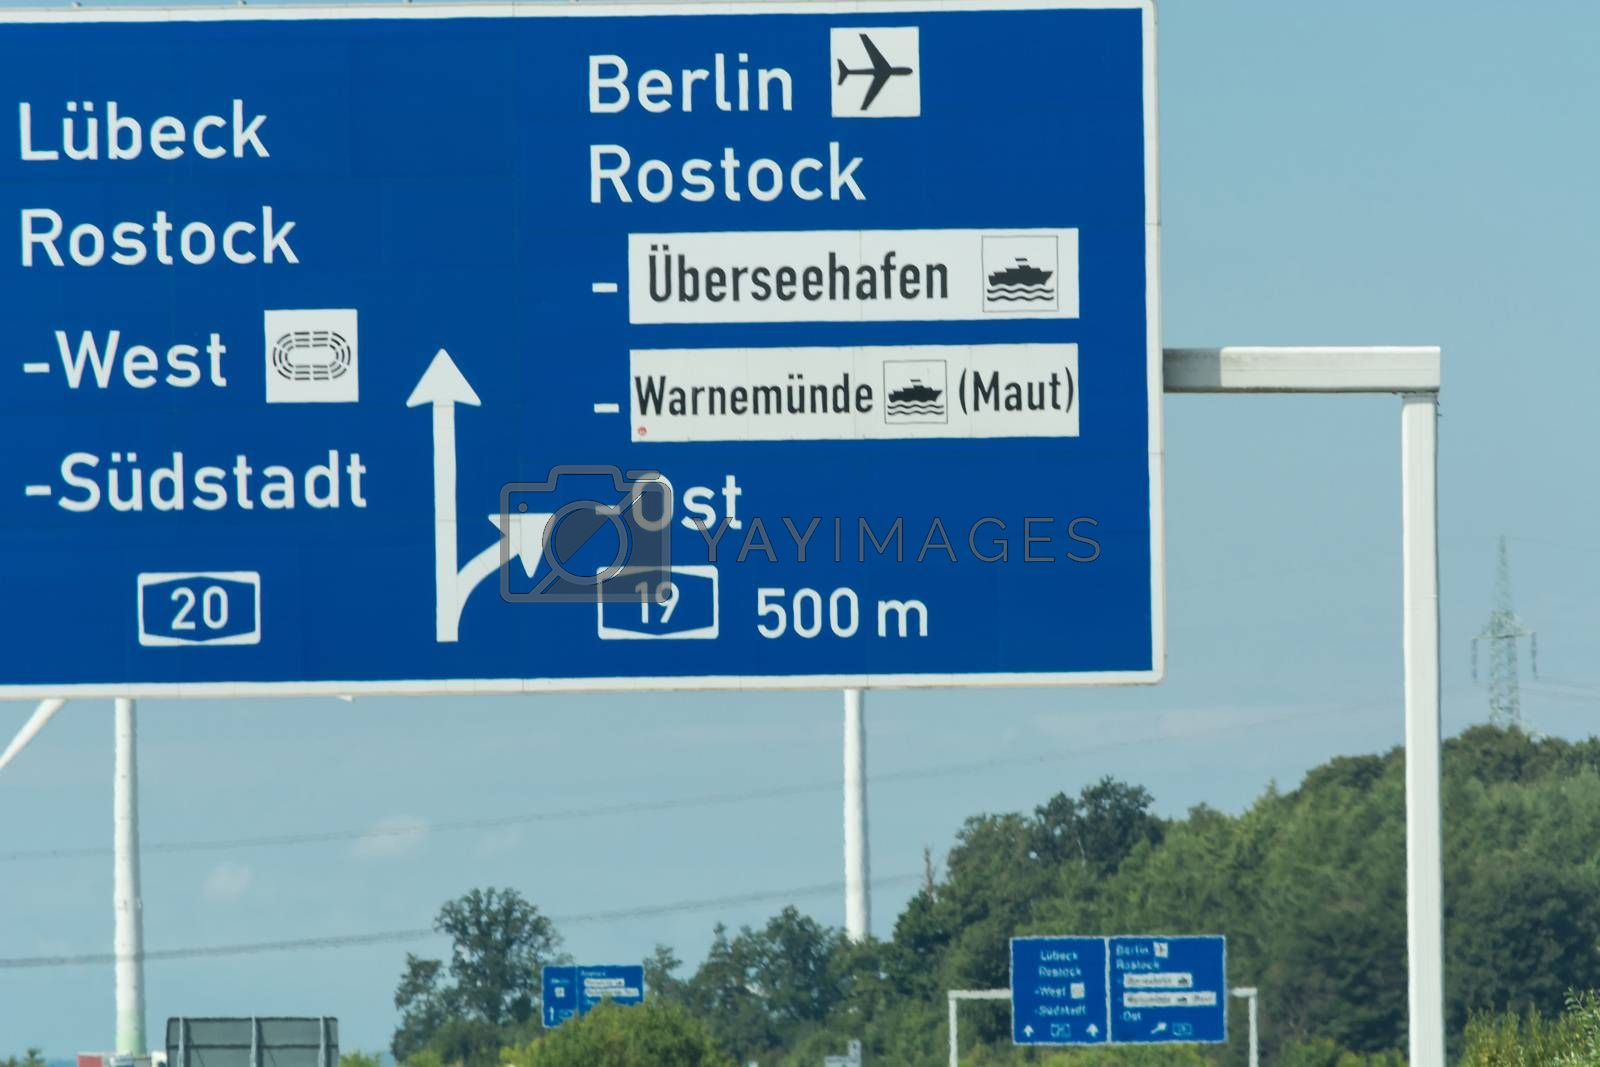 Autobahn sign in Germany Caption on German - city names Berlin, Rostock, Lübeck